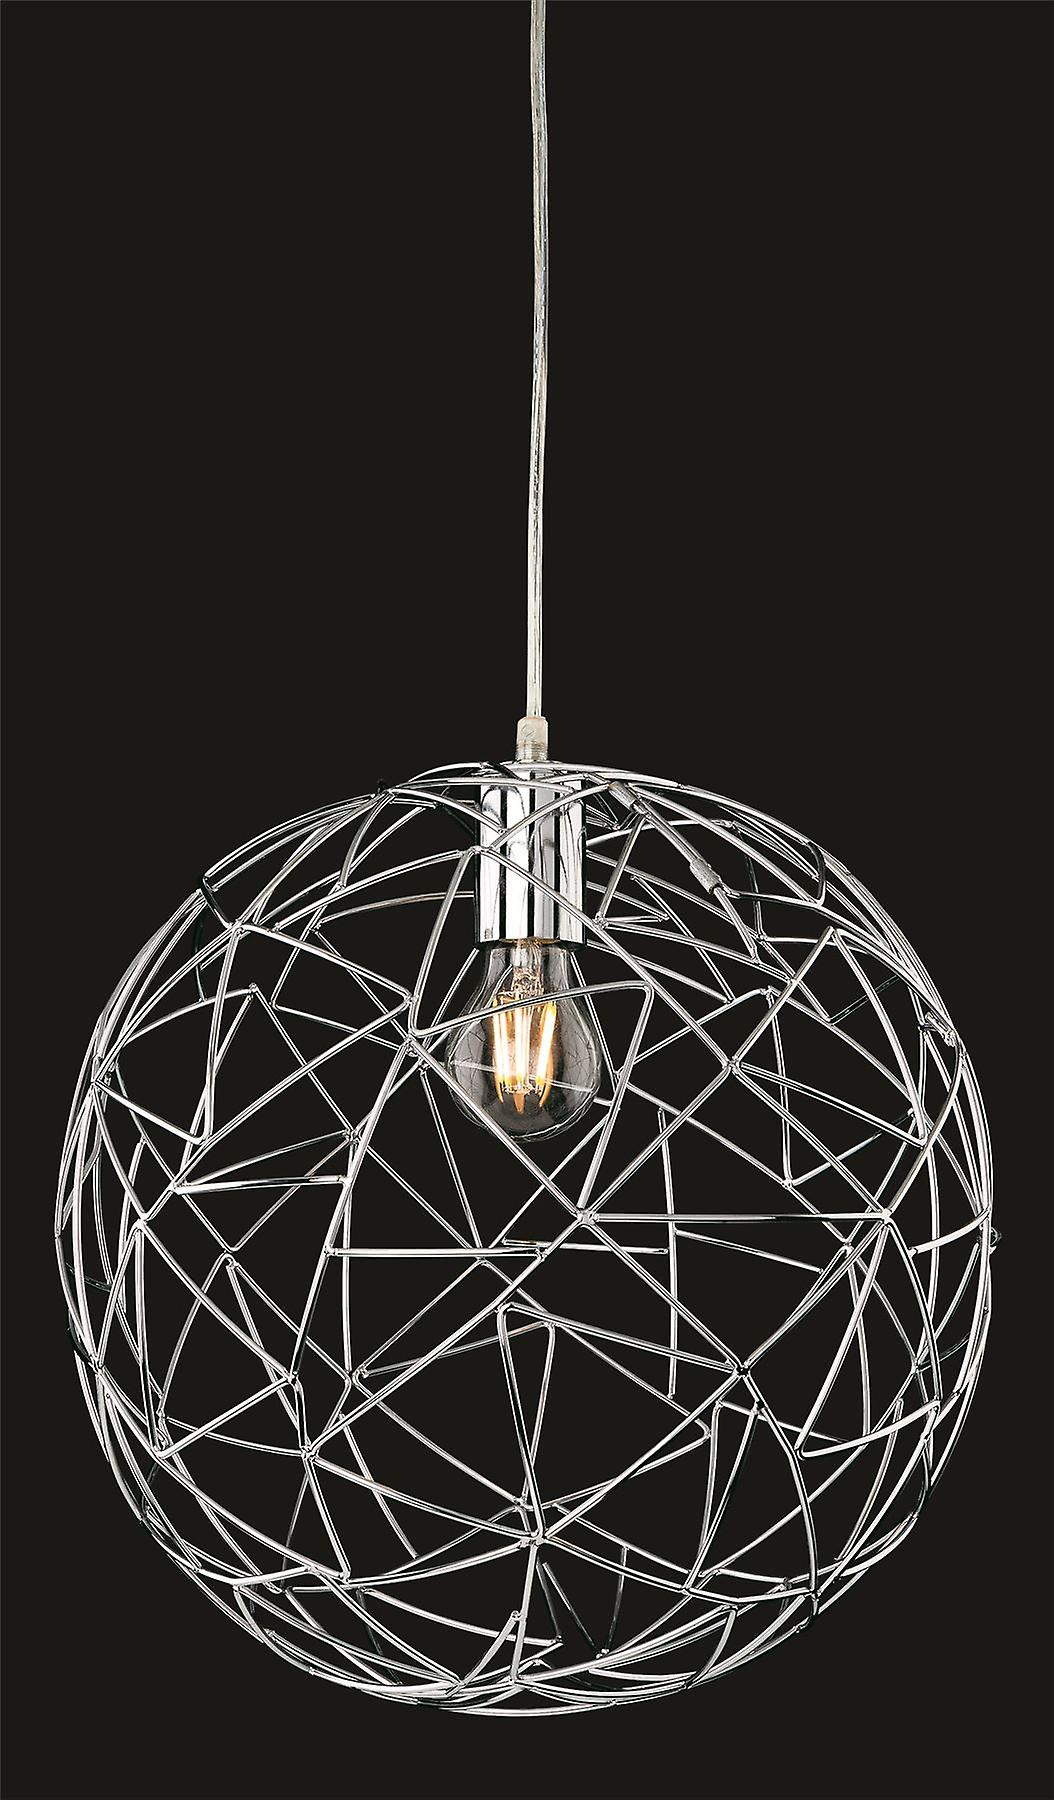 Firstlumière - 1 lumière Ceiling pendentif Chrome - 7638CH